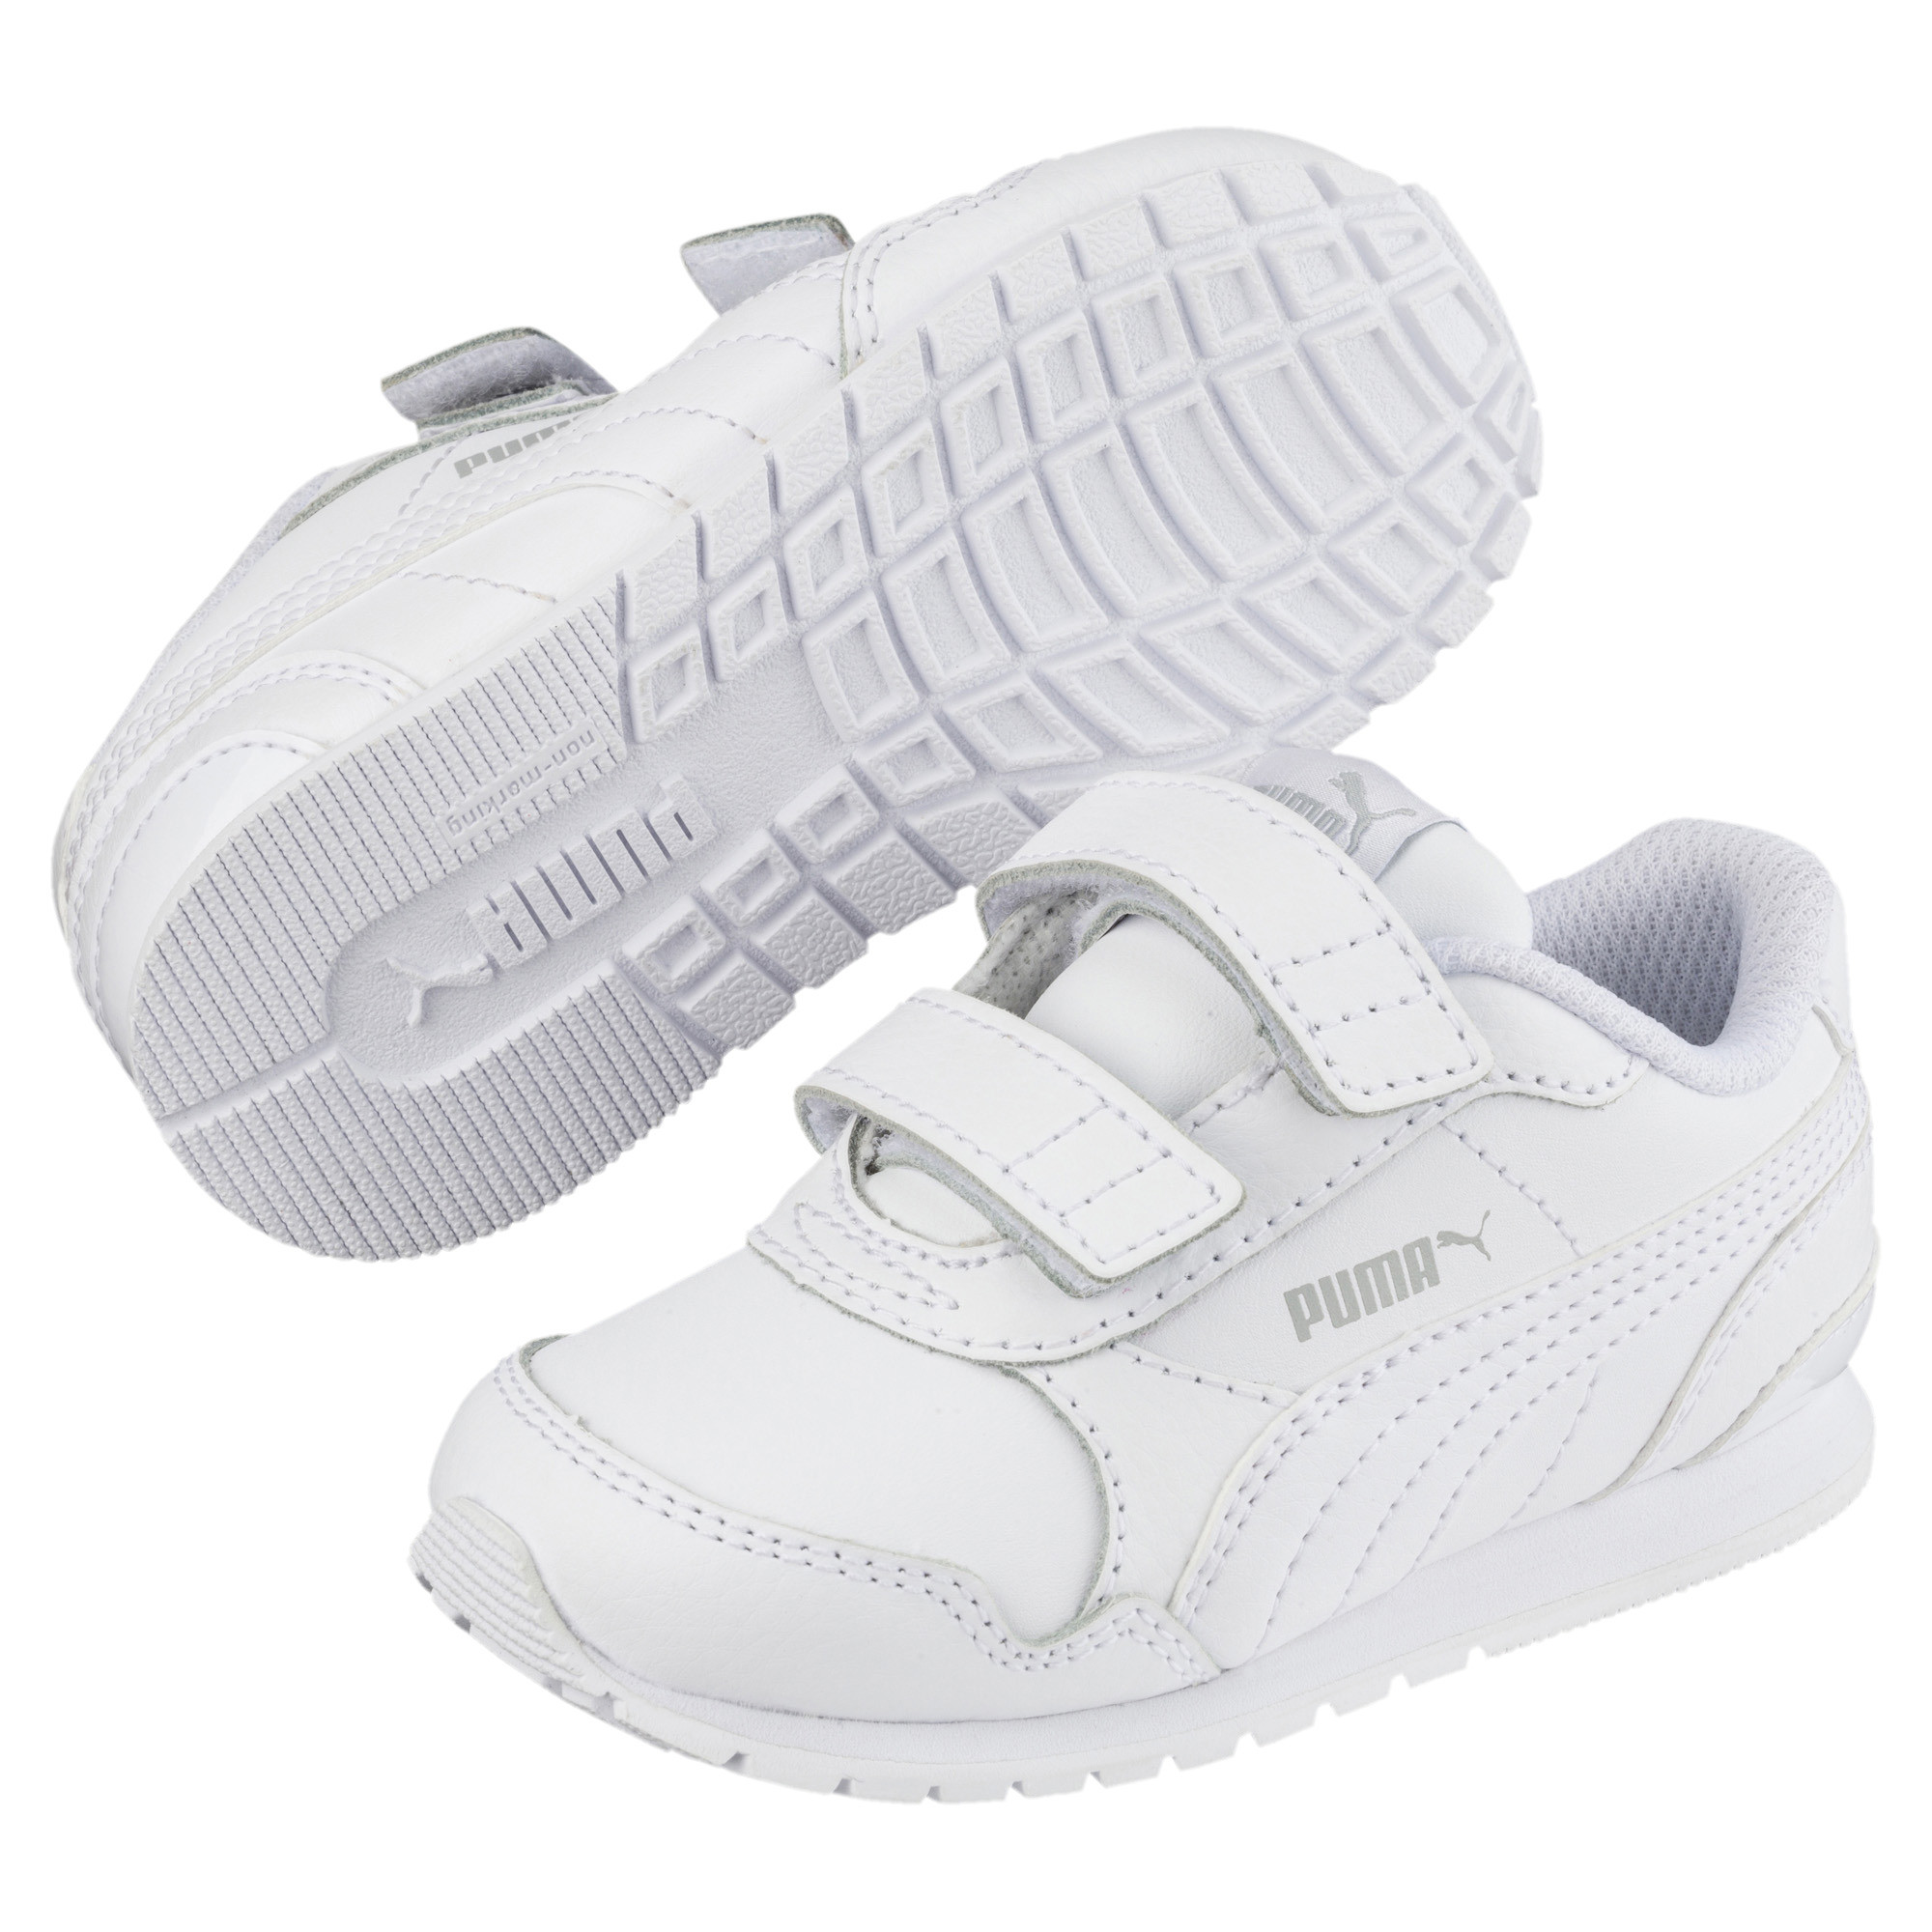 PUMA-ST-Runner-v2-AC-Little-Kids-039-Shoes-Kids-Shoe-Kids thumbnail 5